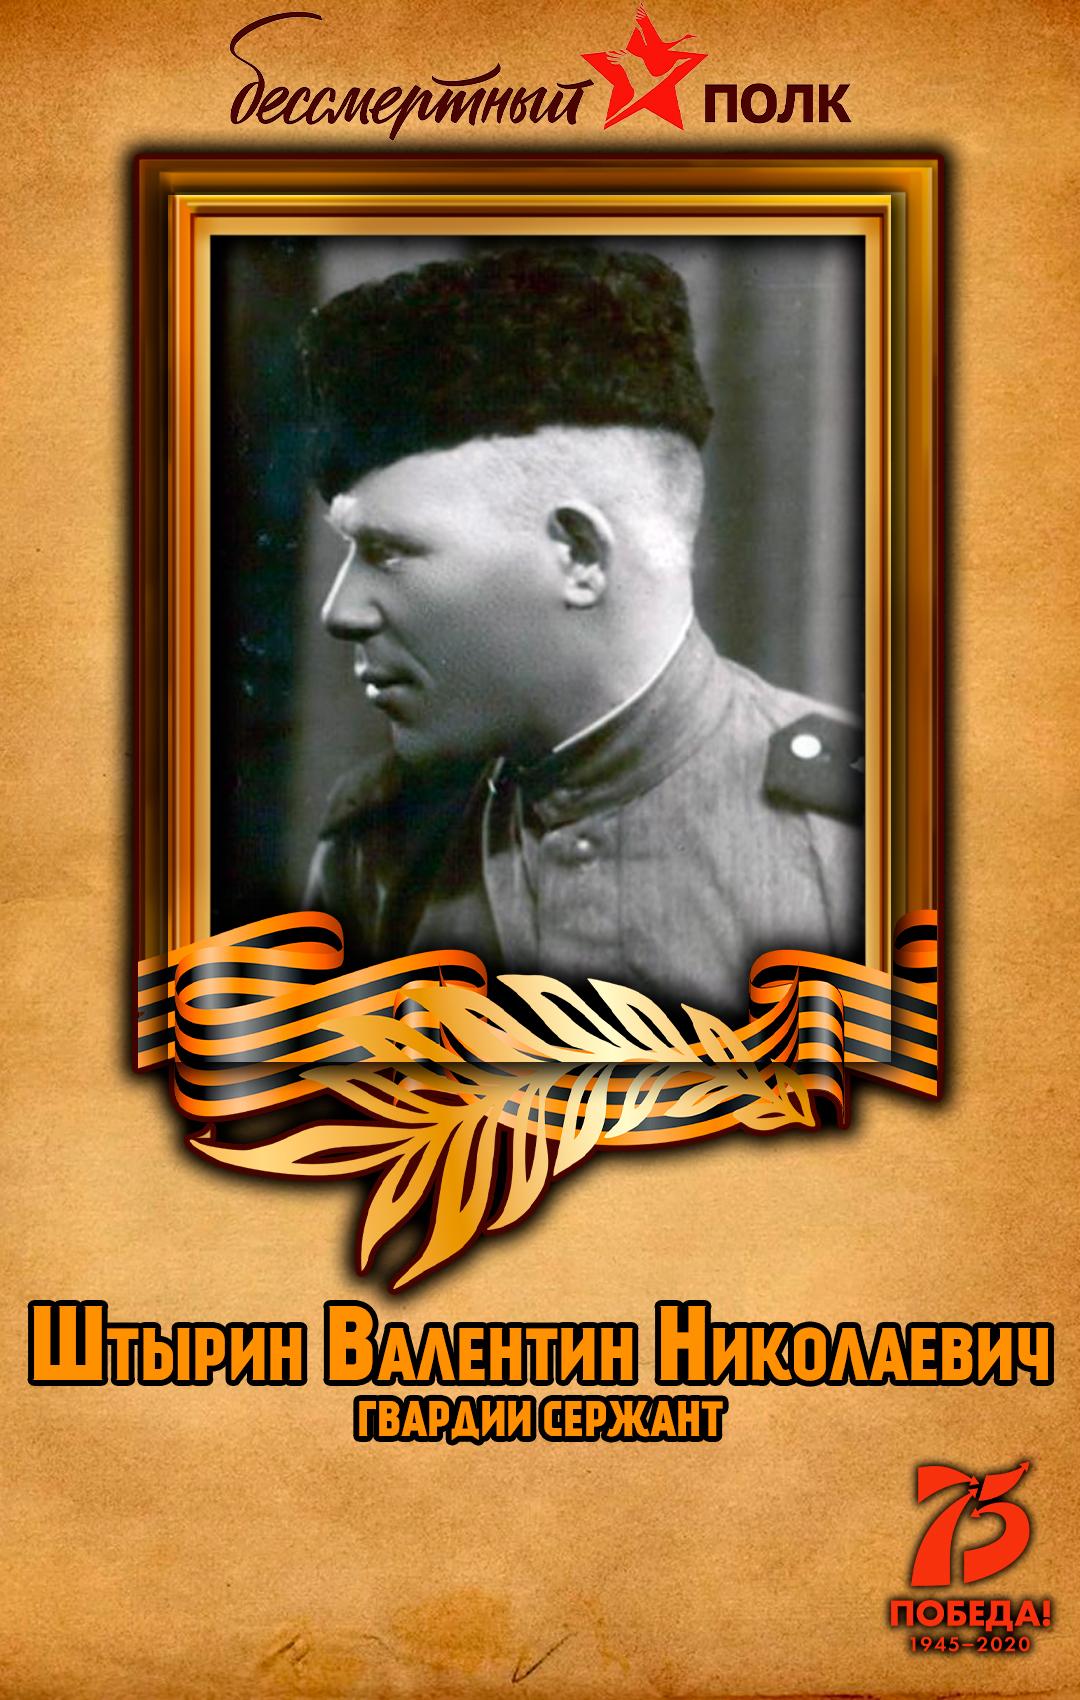 Штырин-Валентин-Николаевич